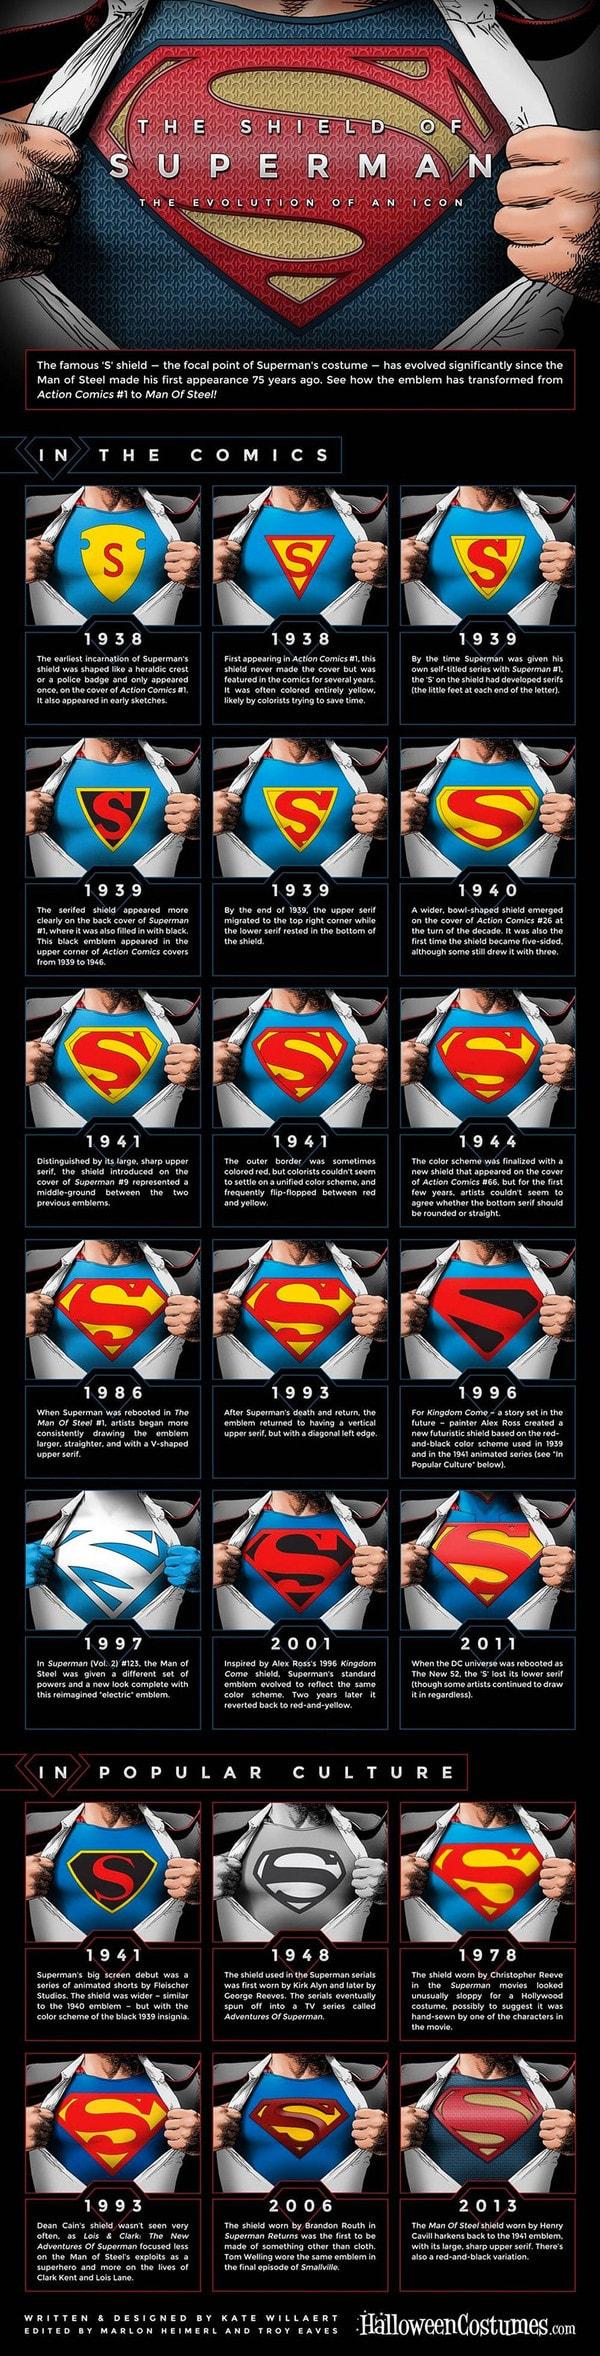 aetherconcept-evolution-logos-superman